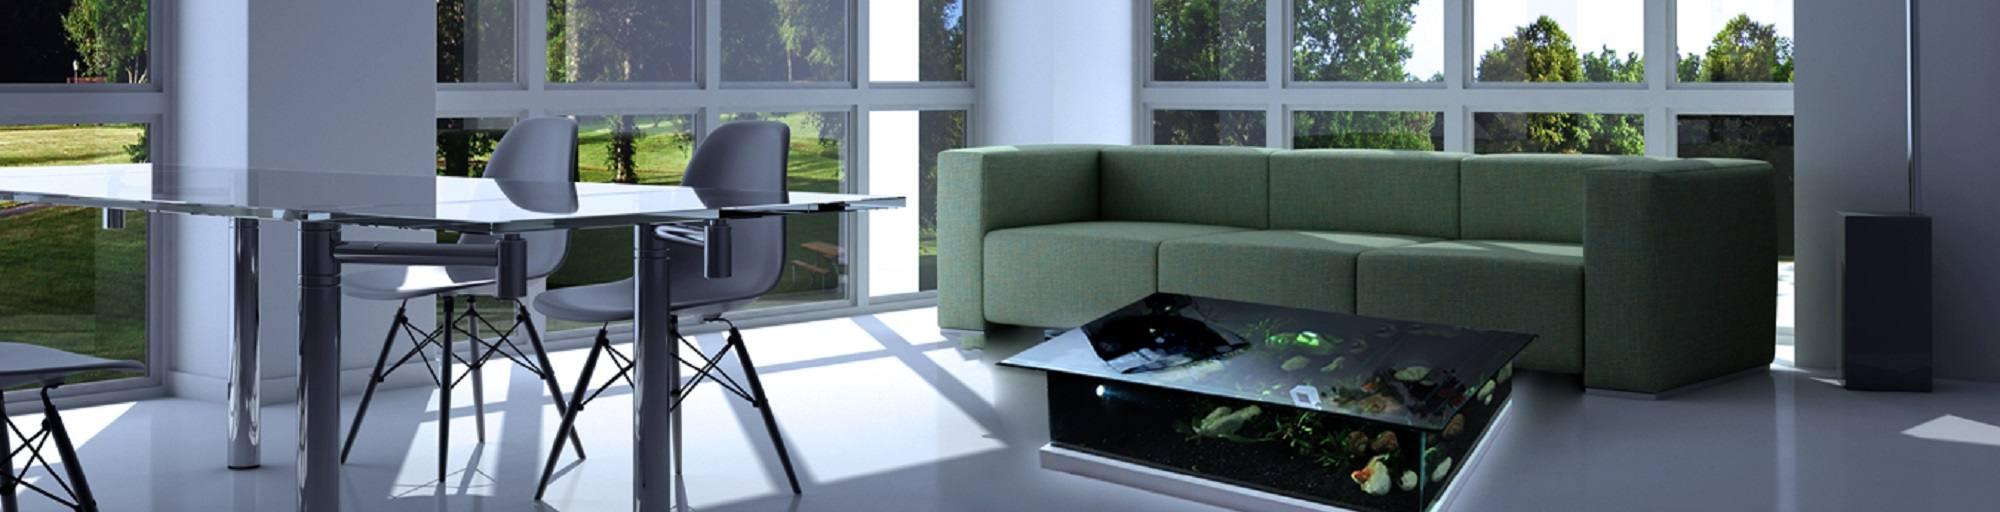 table basse aquarium sur mesure. Black Bedroom Furniture Sets. Home Design Ideas